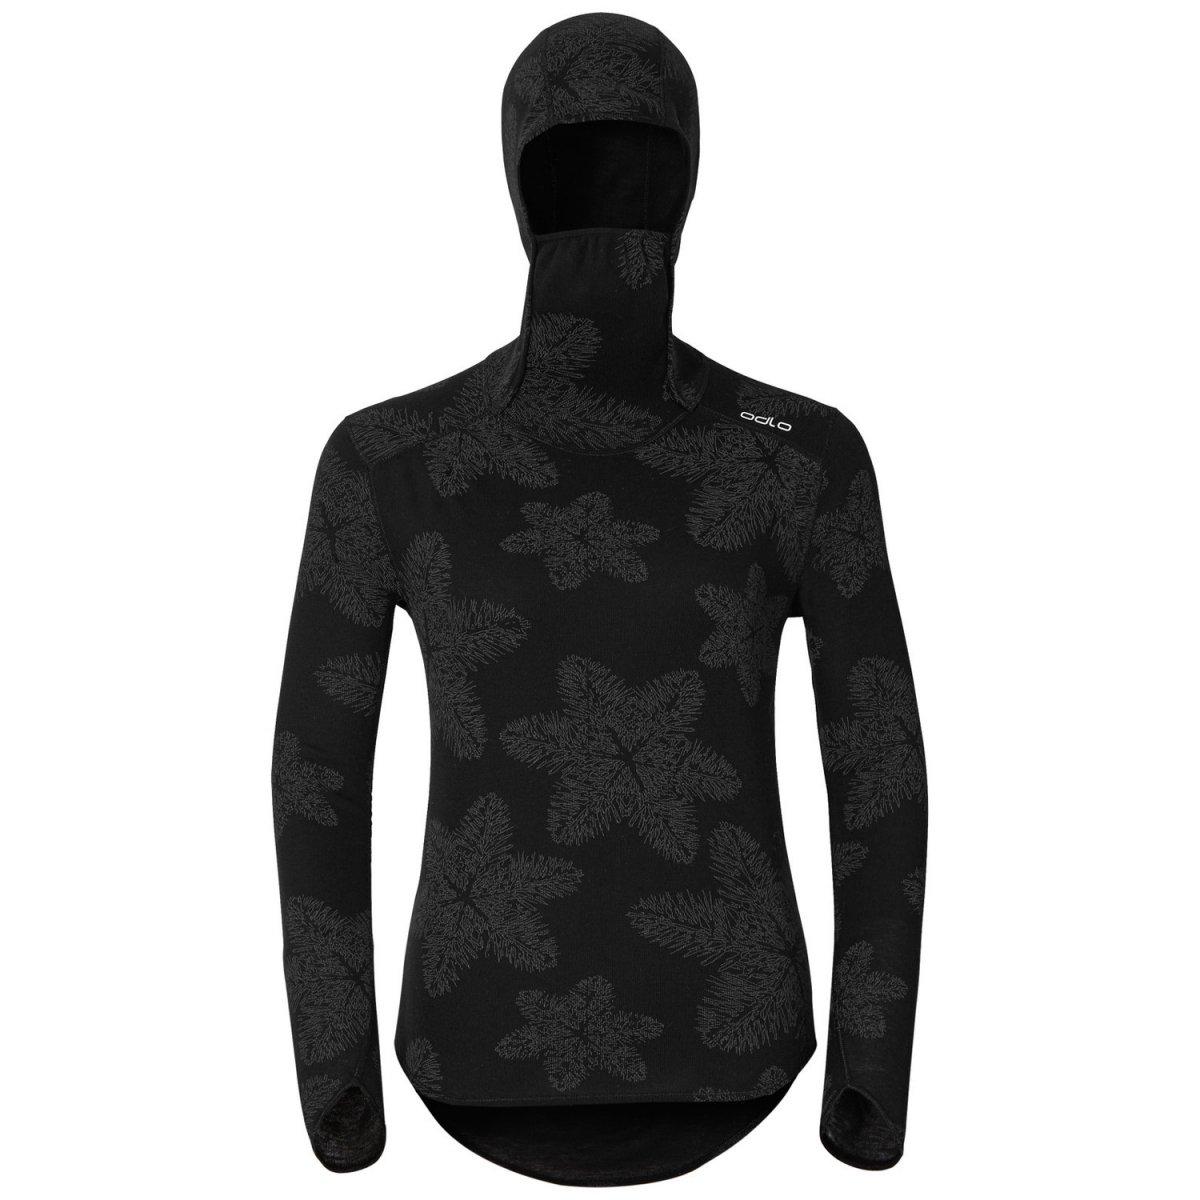 30022a83d2f15d ODLO ORIGINALS WARM koszulka termoaktywna damska z kominiarką ...